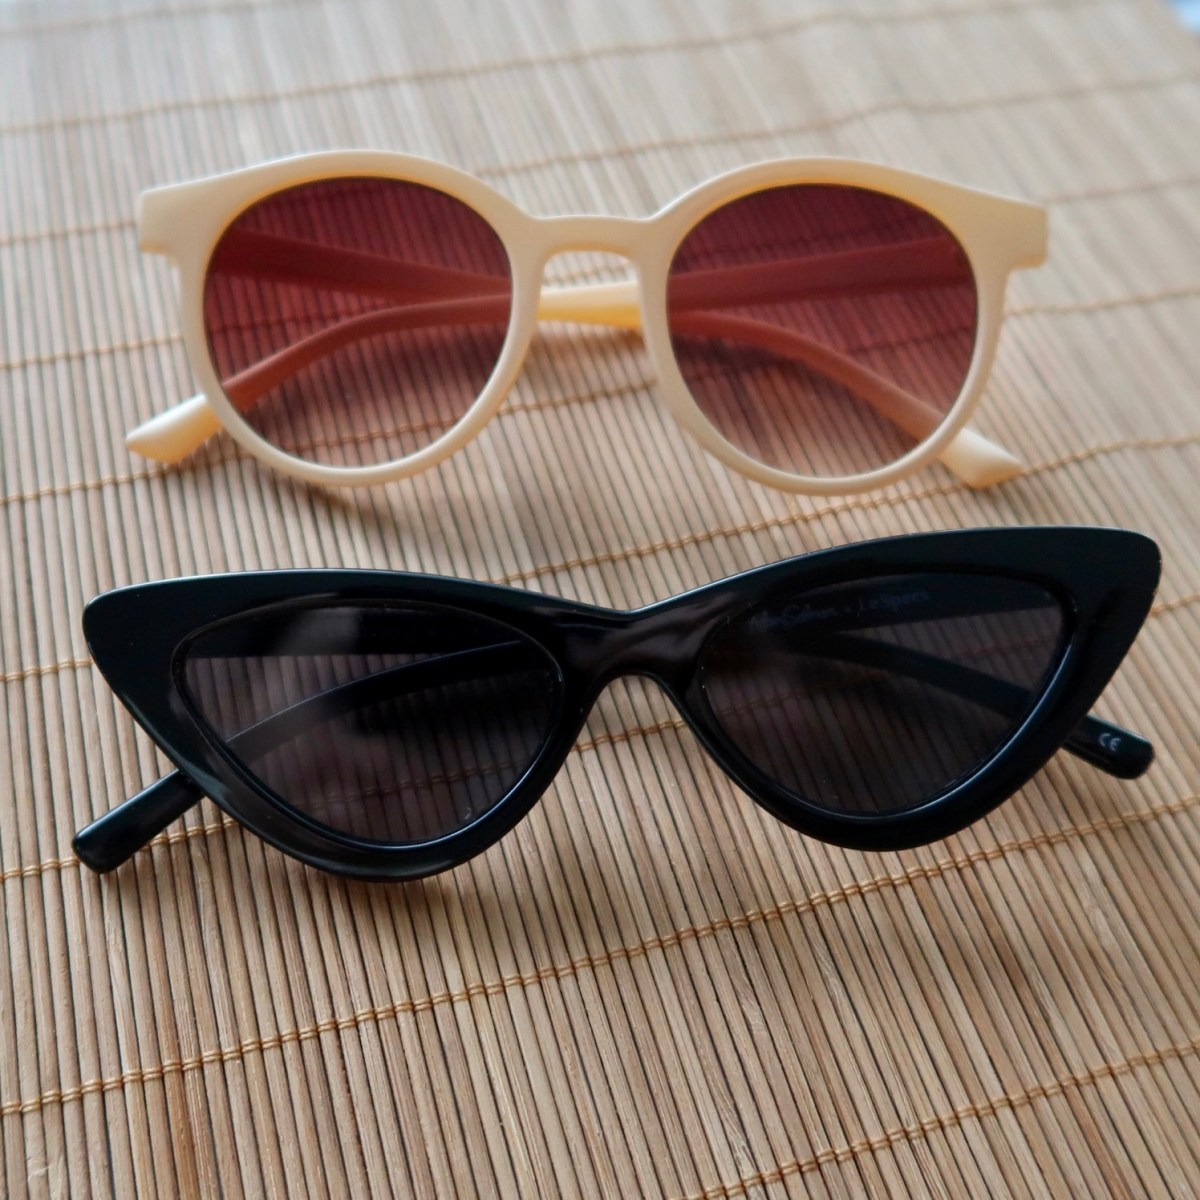 A J Morgan Lowkey Unisex Beige Sunglasses and Le Specs The Last Lolita Black Sunglasses